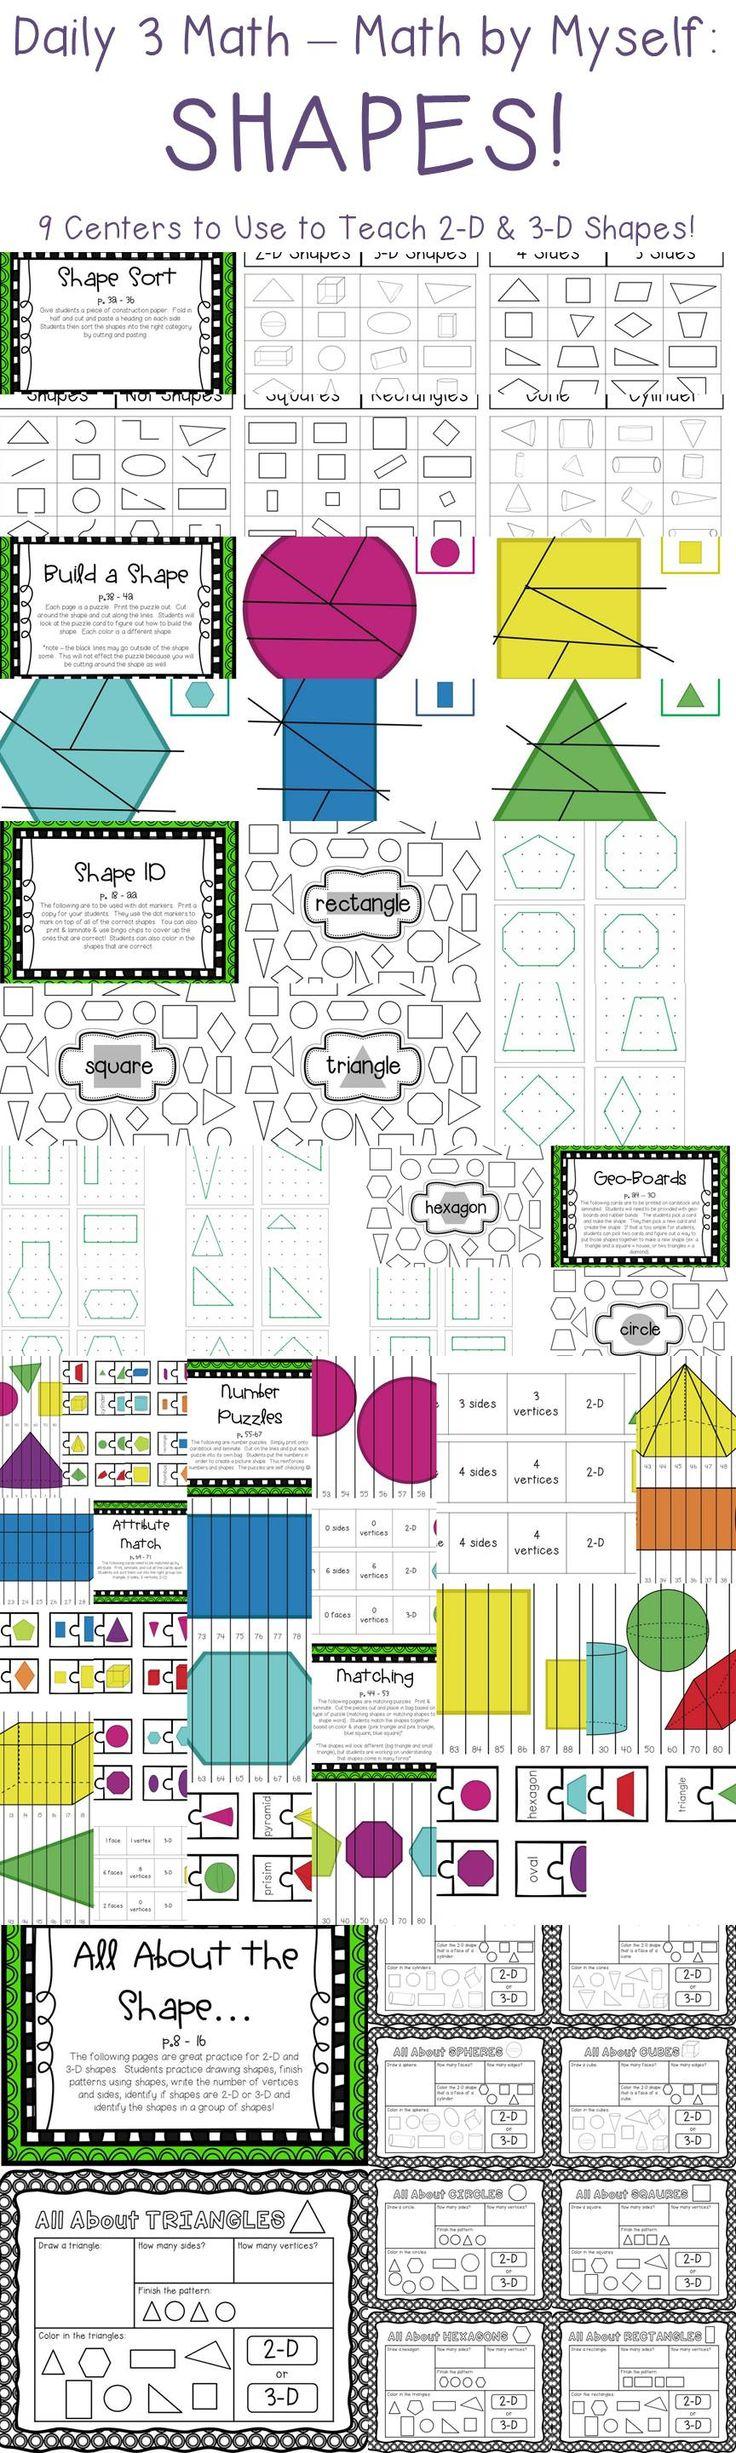 Berühmt Gemeinsame Kernarbeitsblätter Standards Mathe 4Klasse Fotos ...